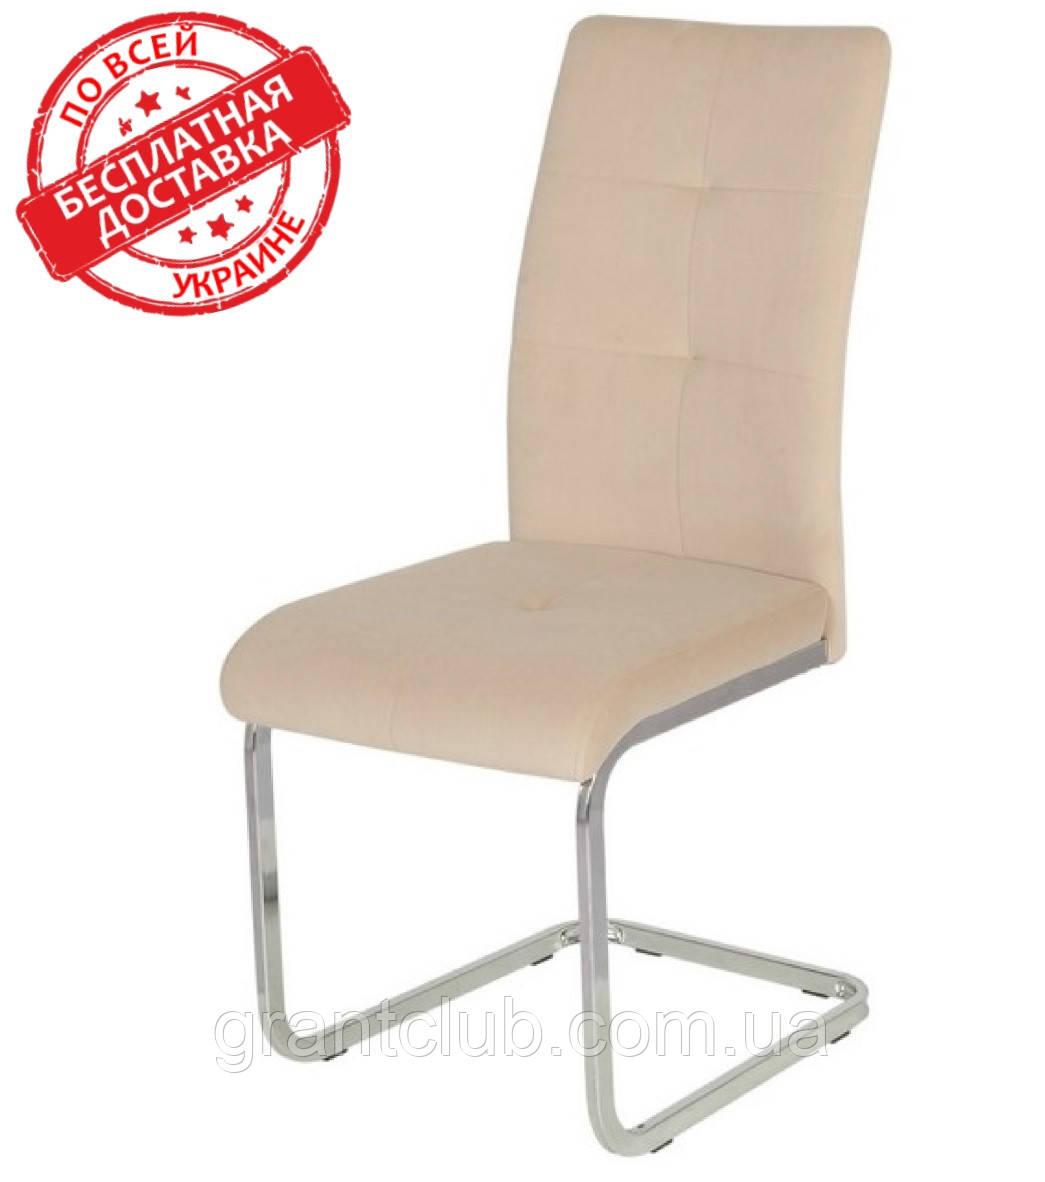 М'який стілець S-119 капучіно вельвет Vetro Mebel (безкоштовна доставка)